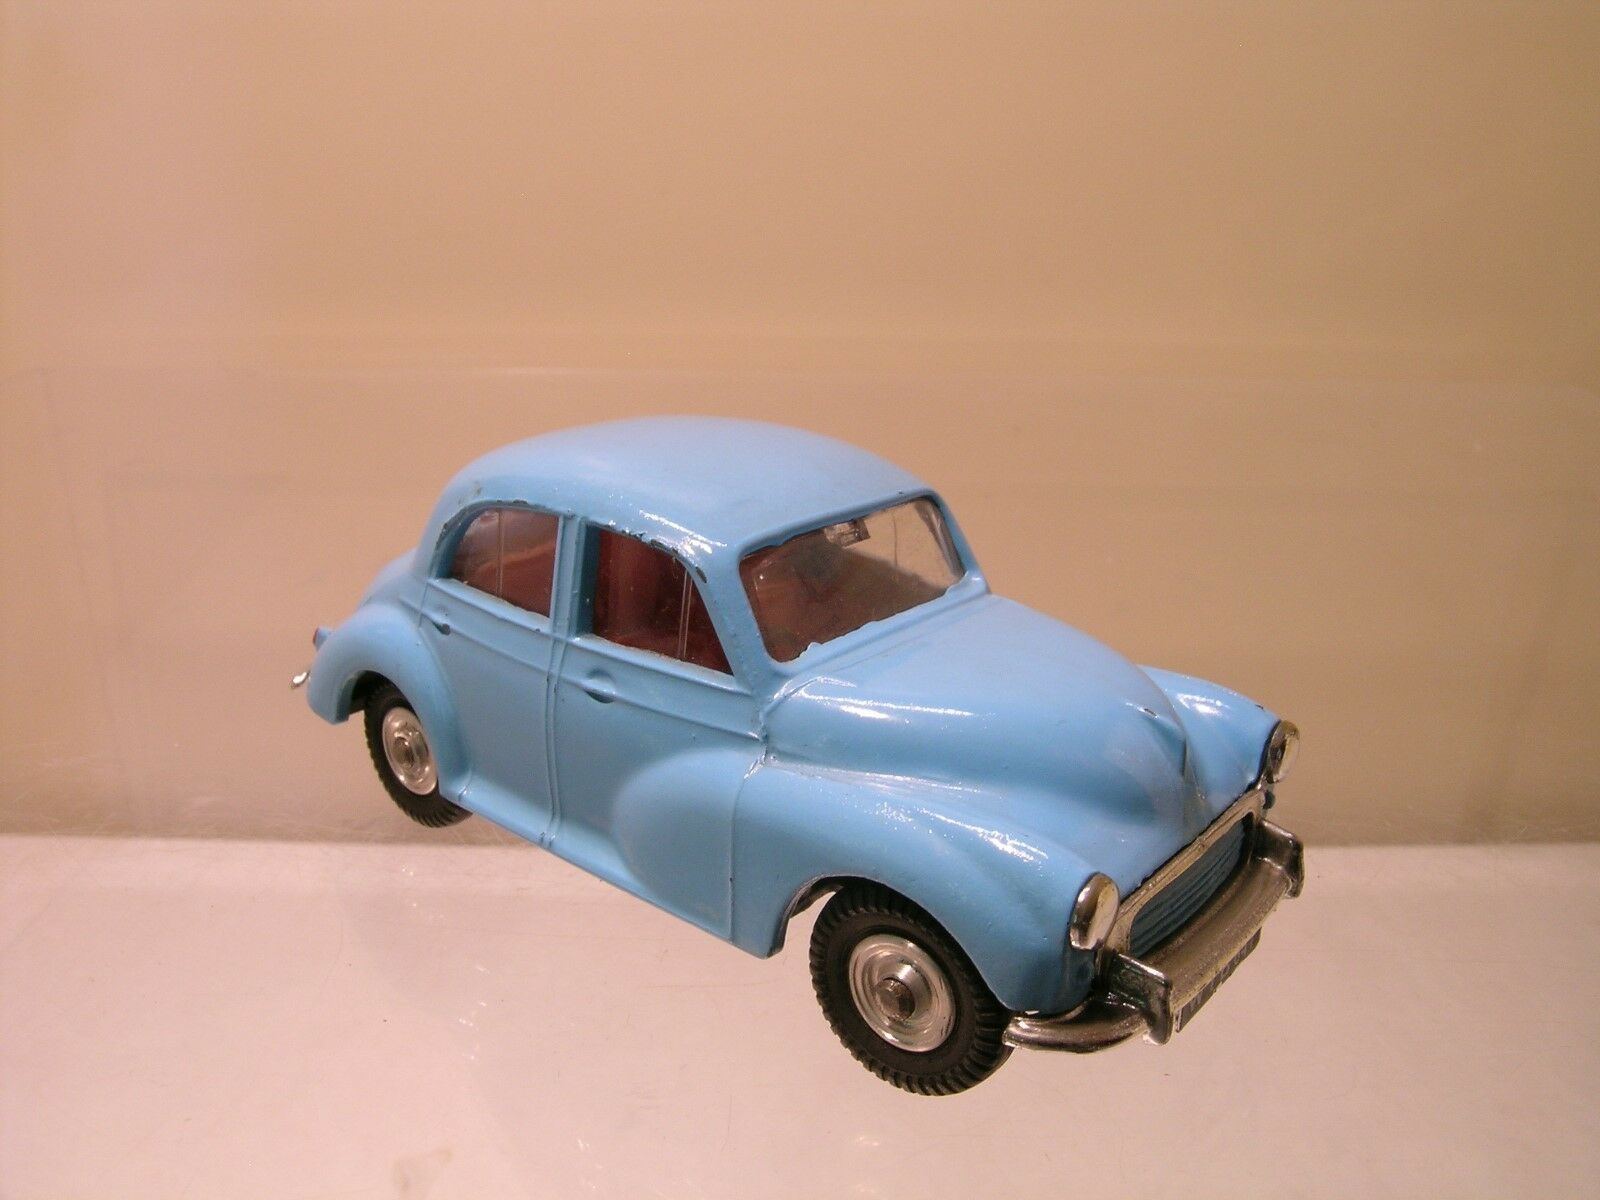 SPOT-ON  TRI-ANG No.289 1963 MORRIS MINOR 1000 LIGHT azul SCALE 1 42